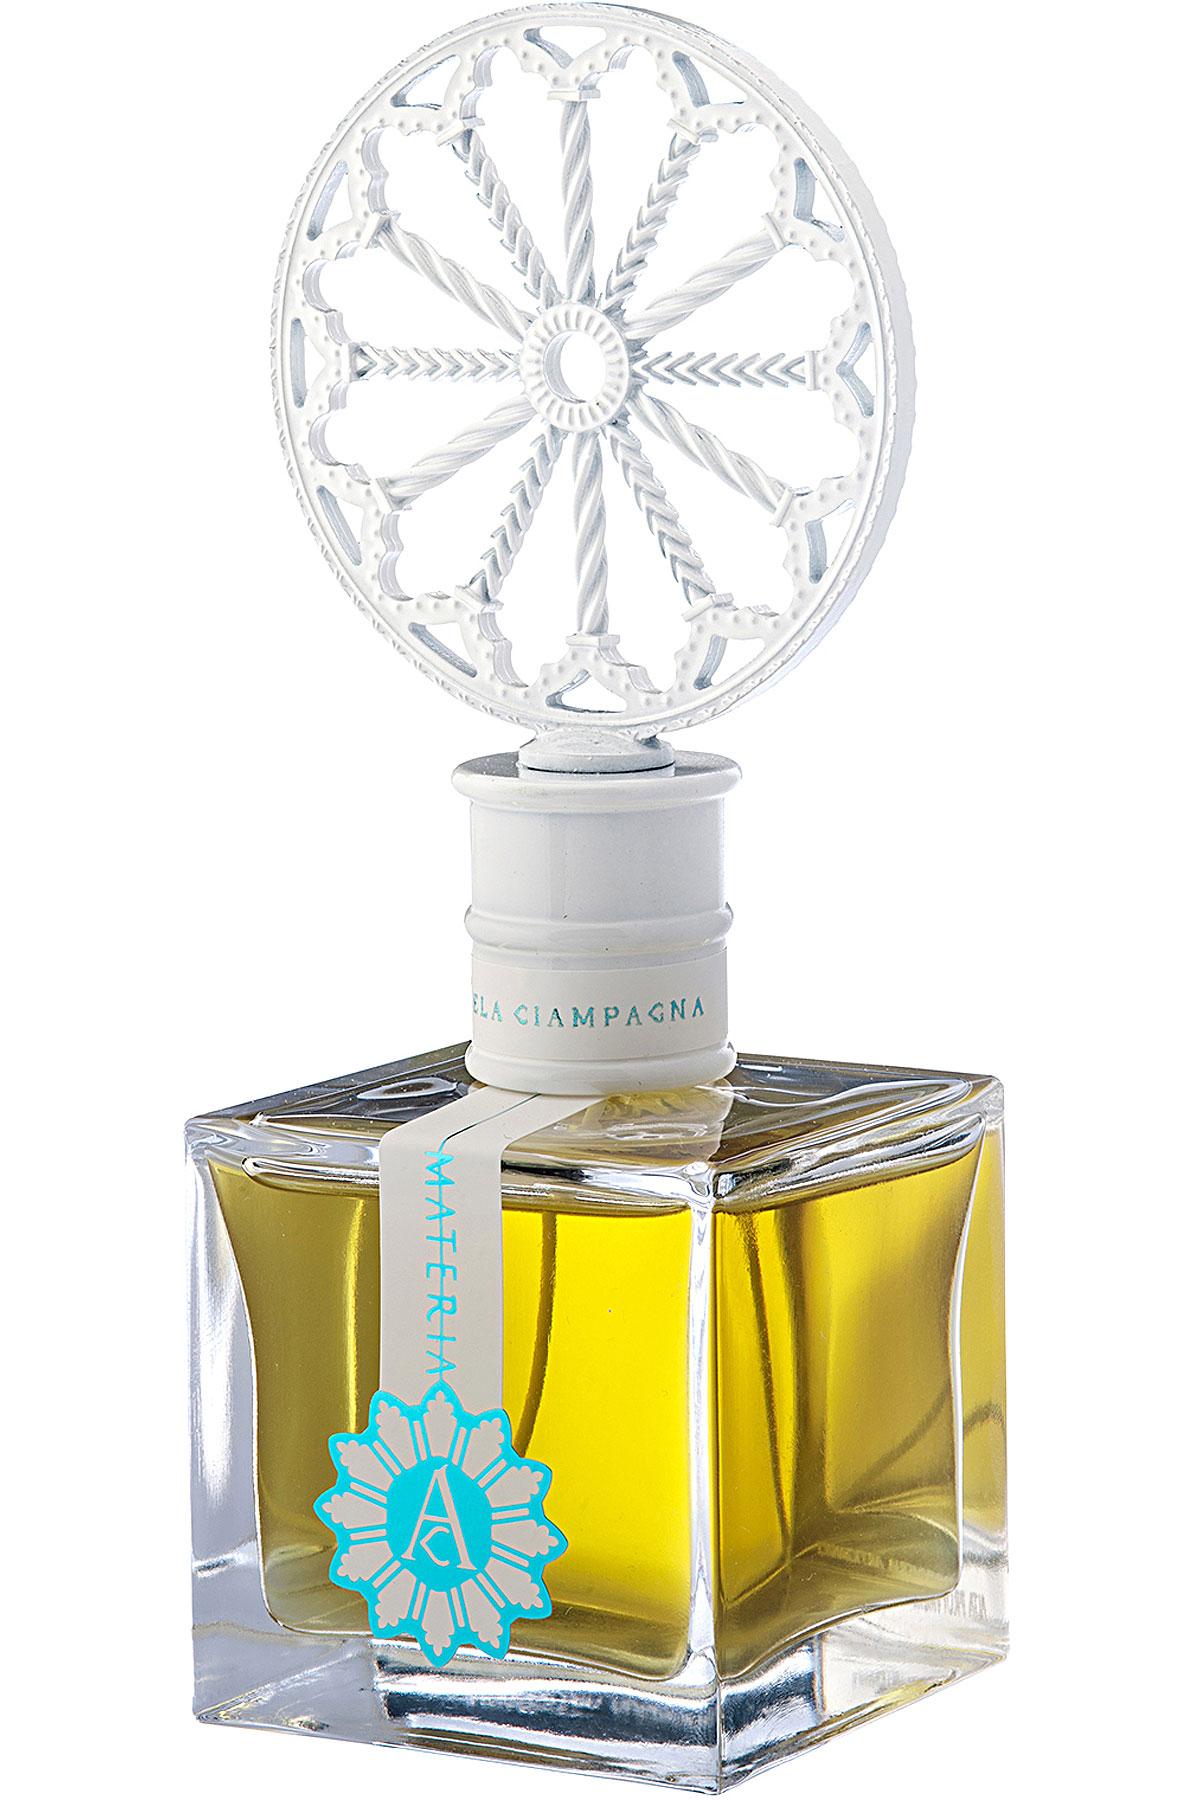 Angela Ciampagna Fragrances for Women, Materia - Extrait De Parfum - 100 Ml, 2019, 100 ml